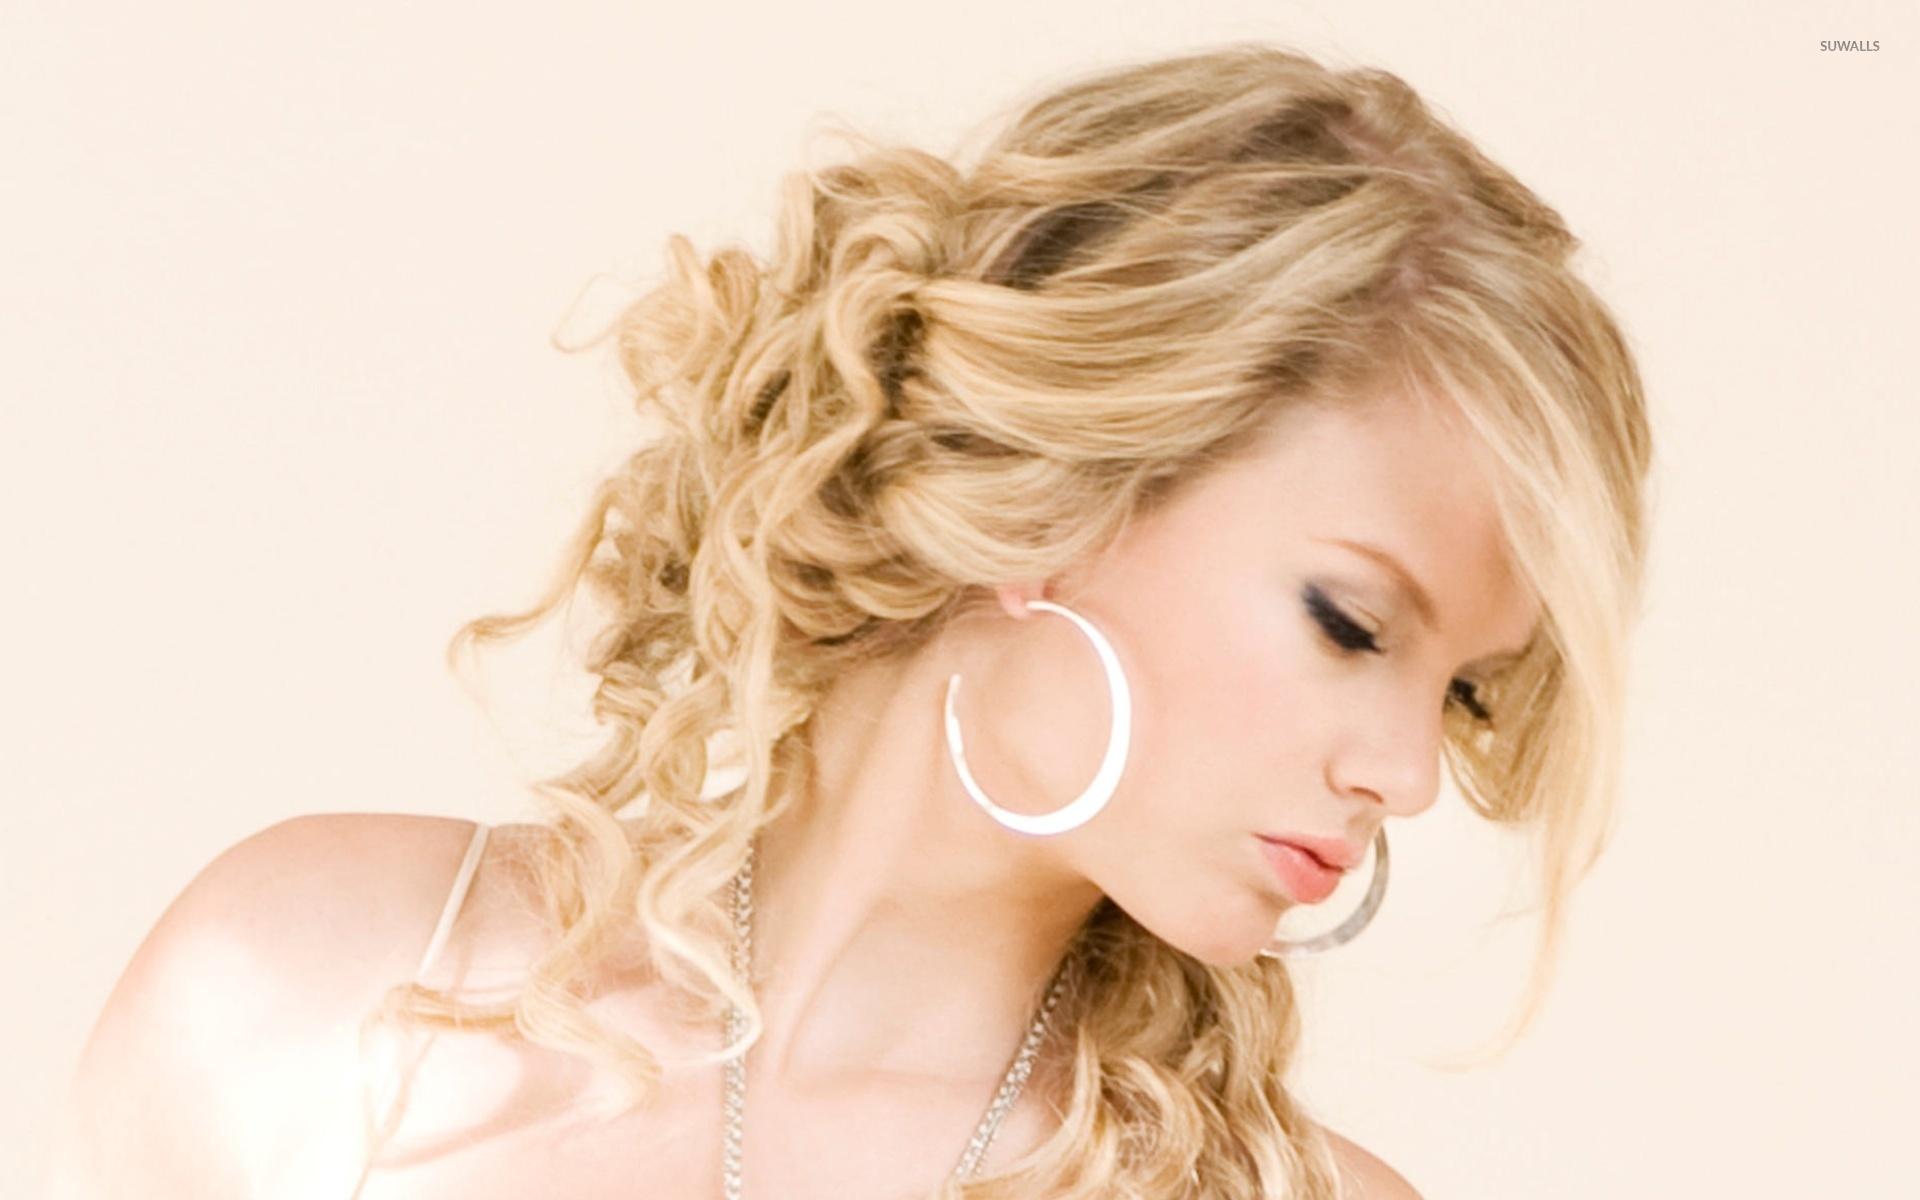 Taylor Swift wallpaper   Celebrity wallpapers   1549 1920x1200